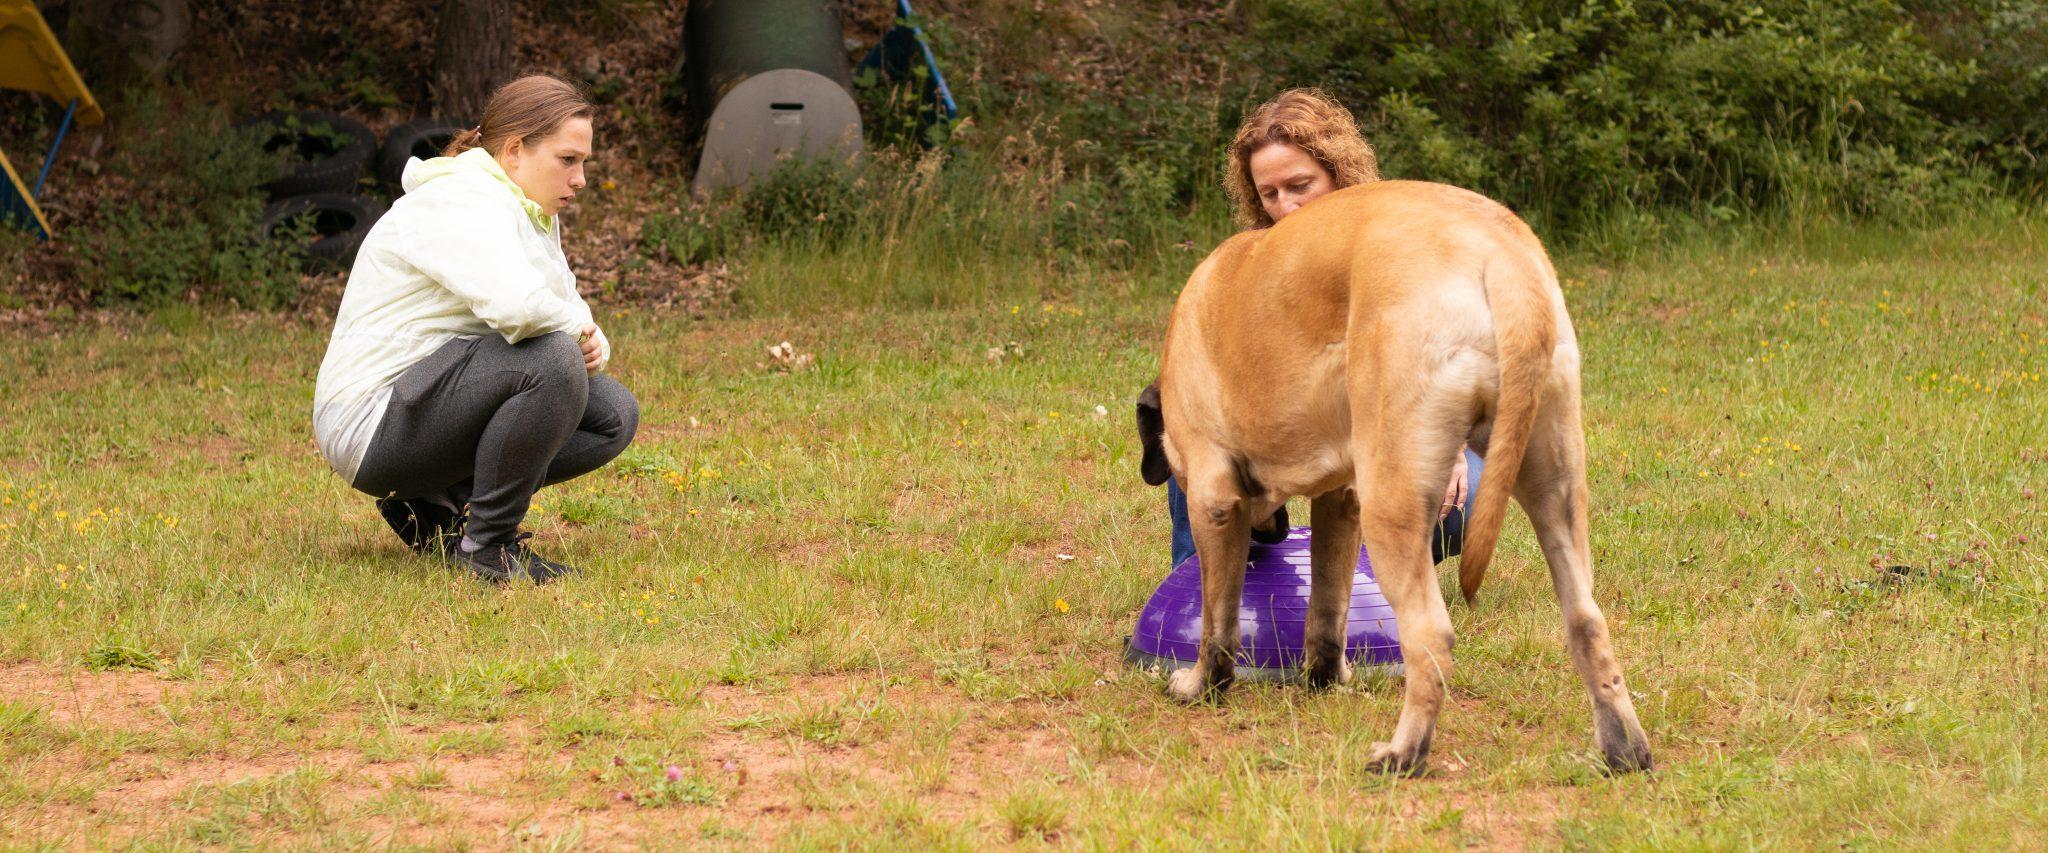 Trainingstherapie für Hundesportler